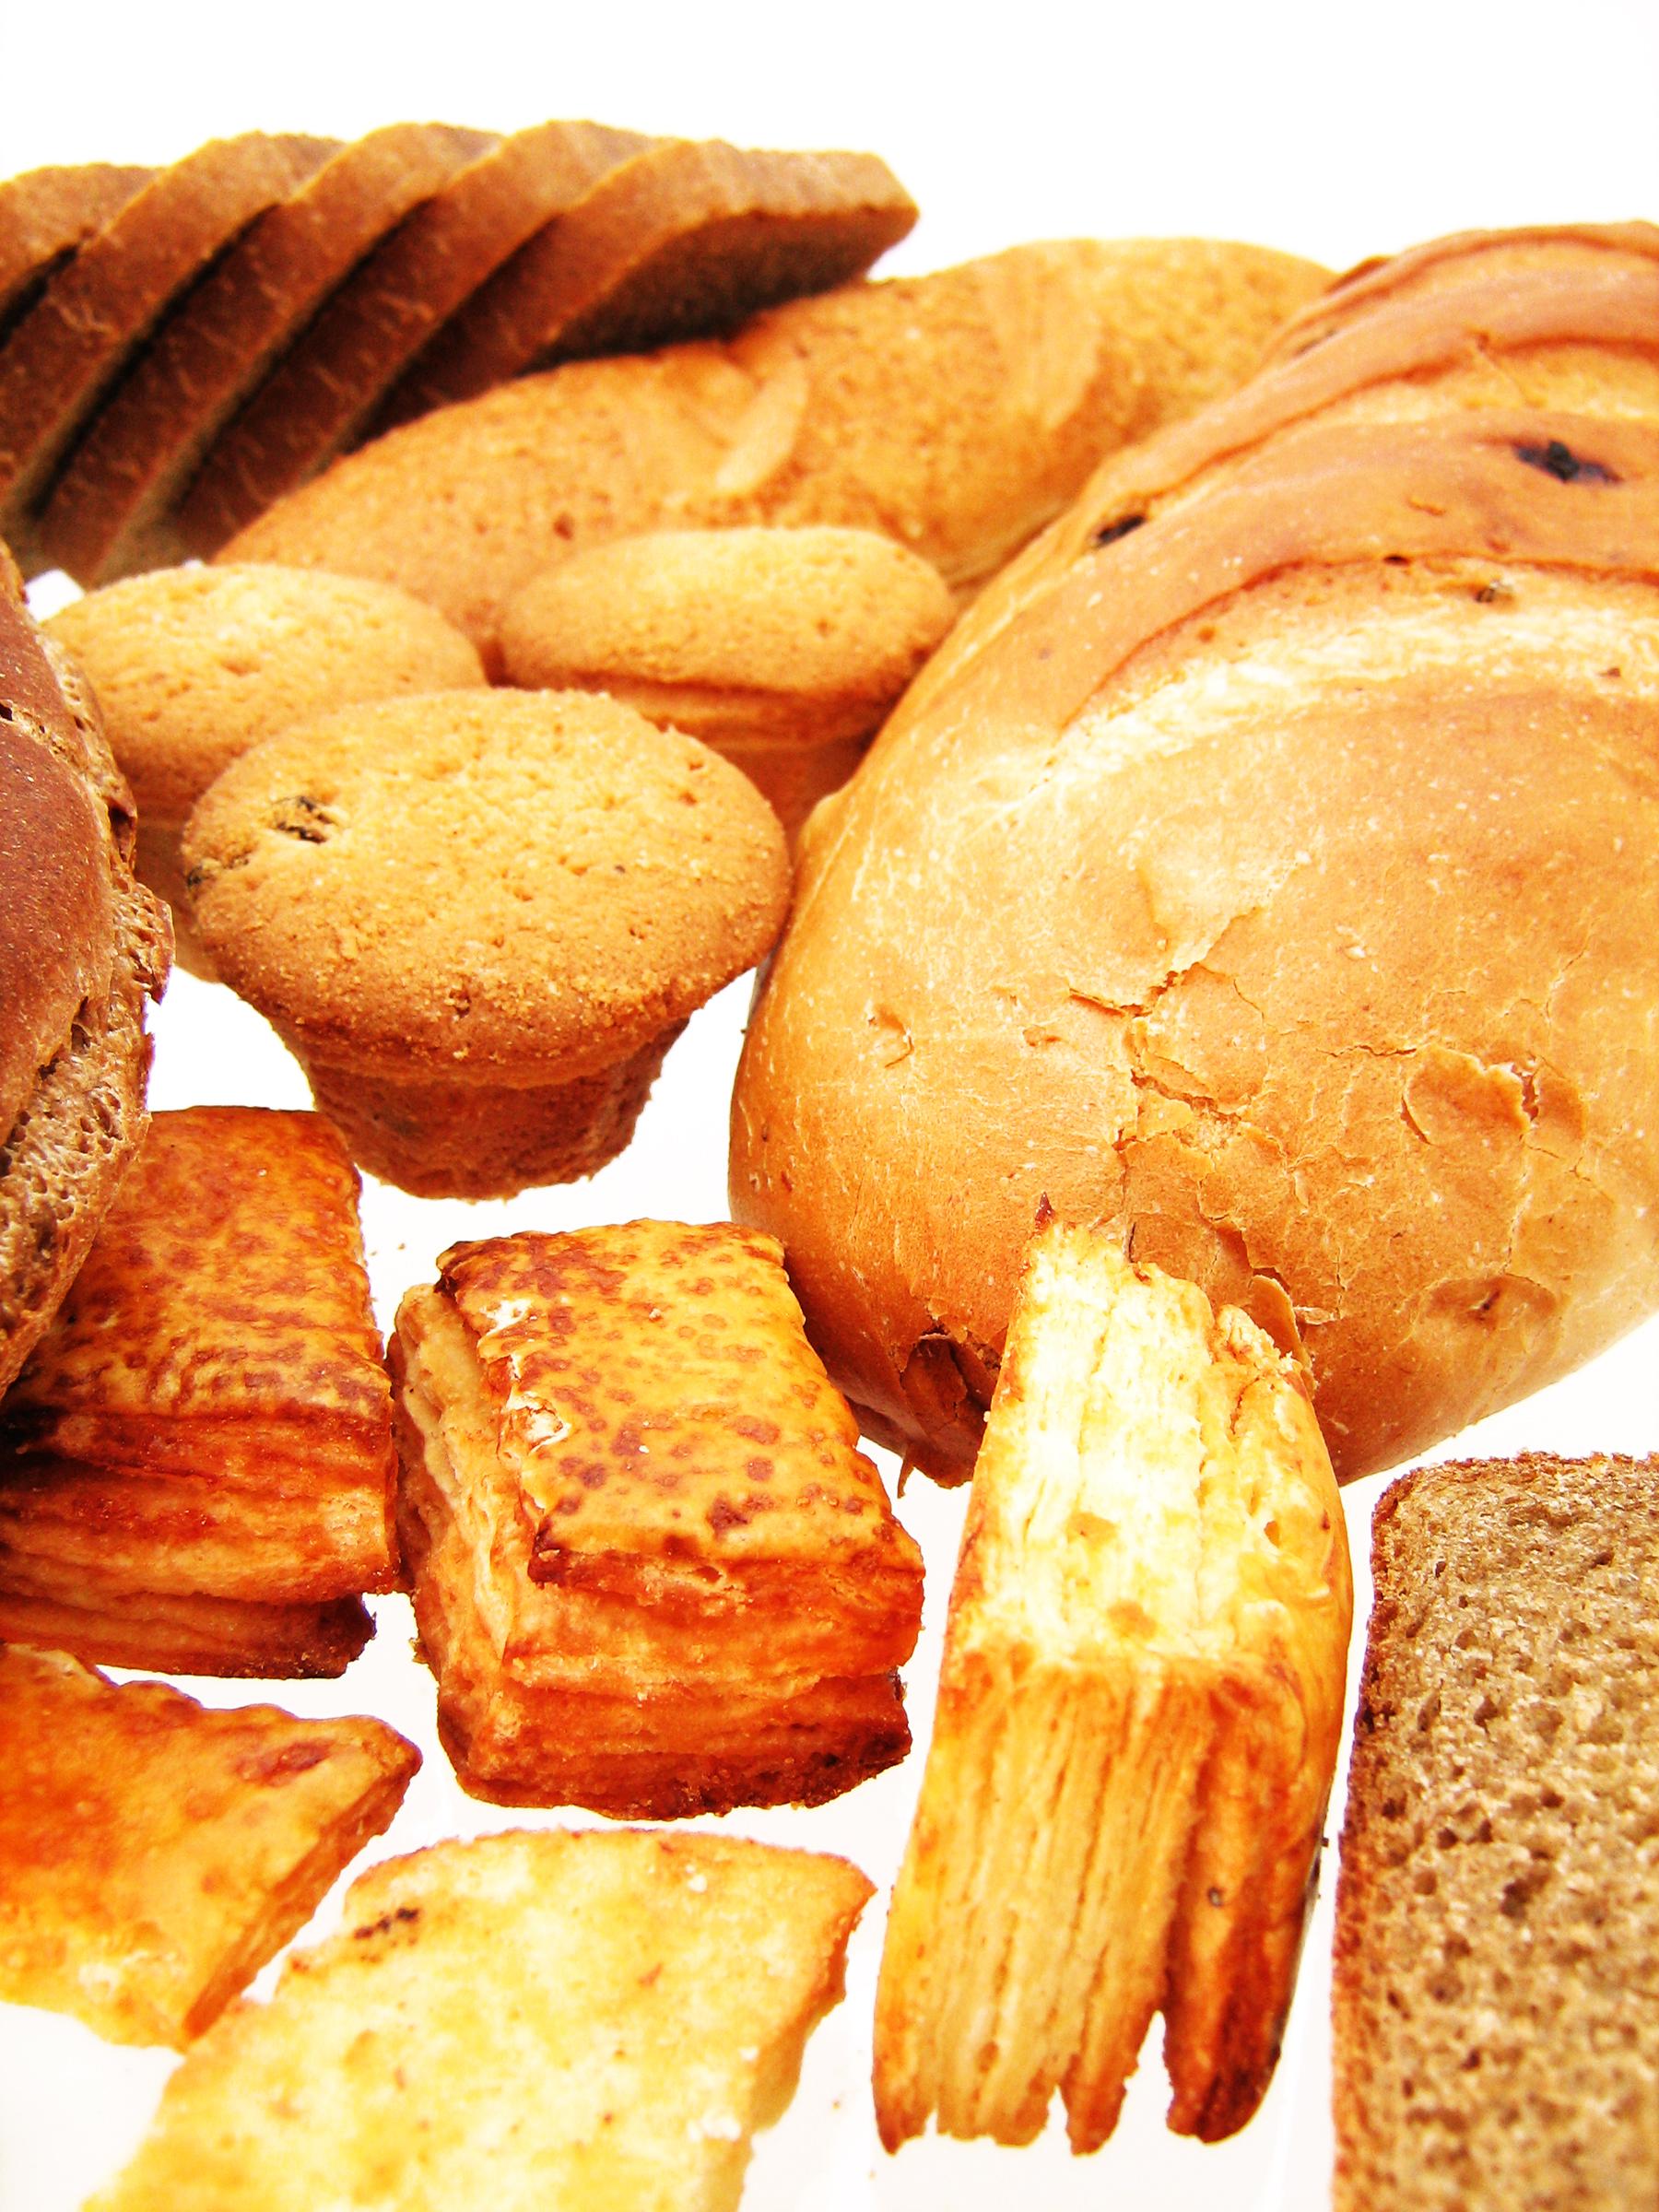 bread and buns, Bakery, Bread, Breakfast, Bun, HQ Photo